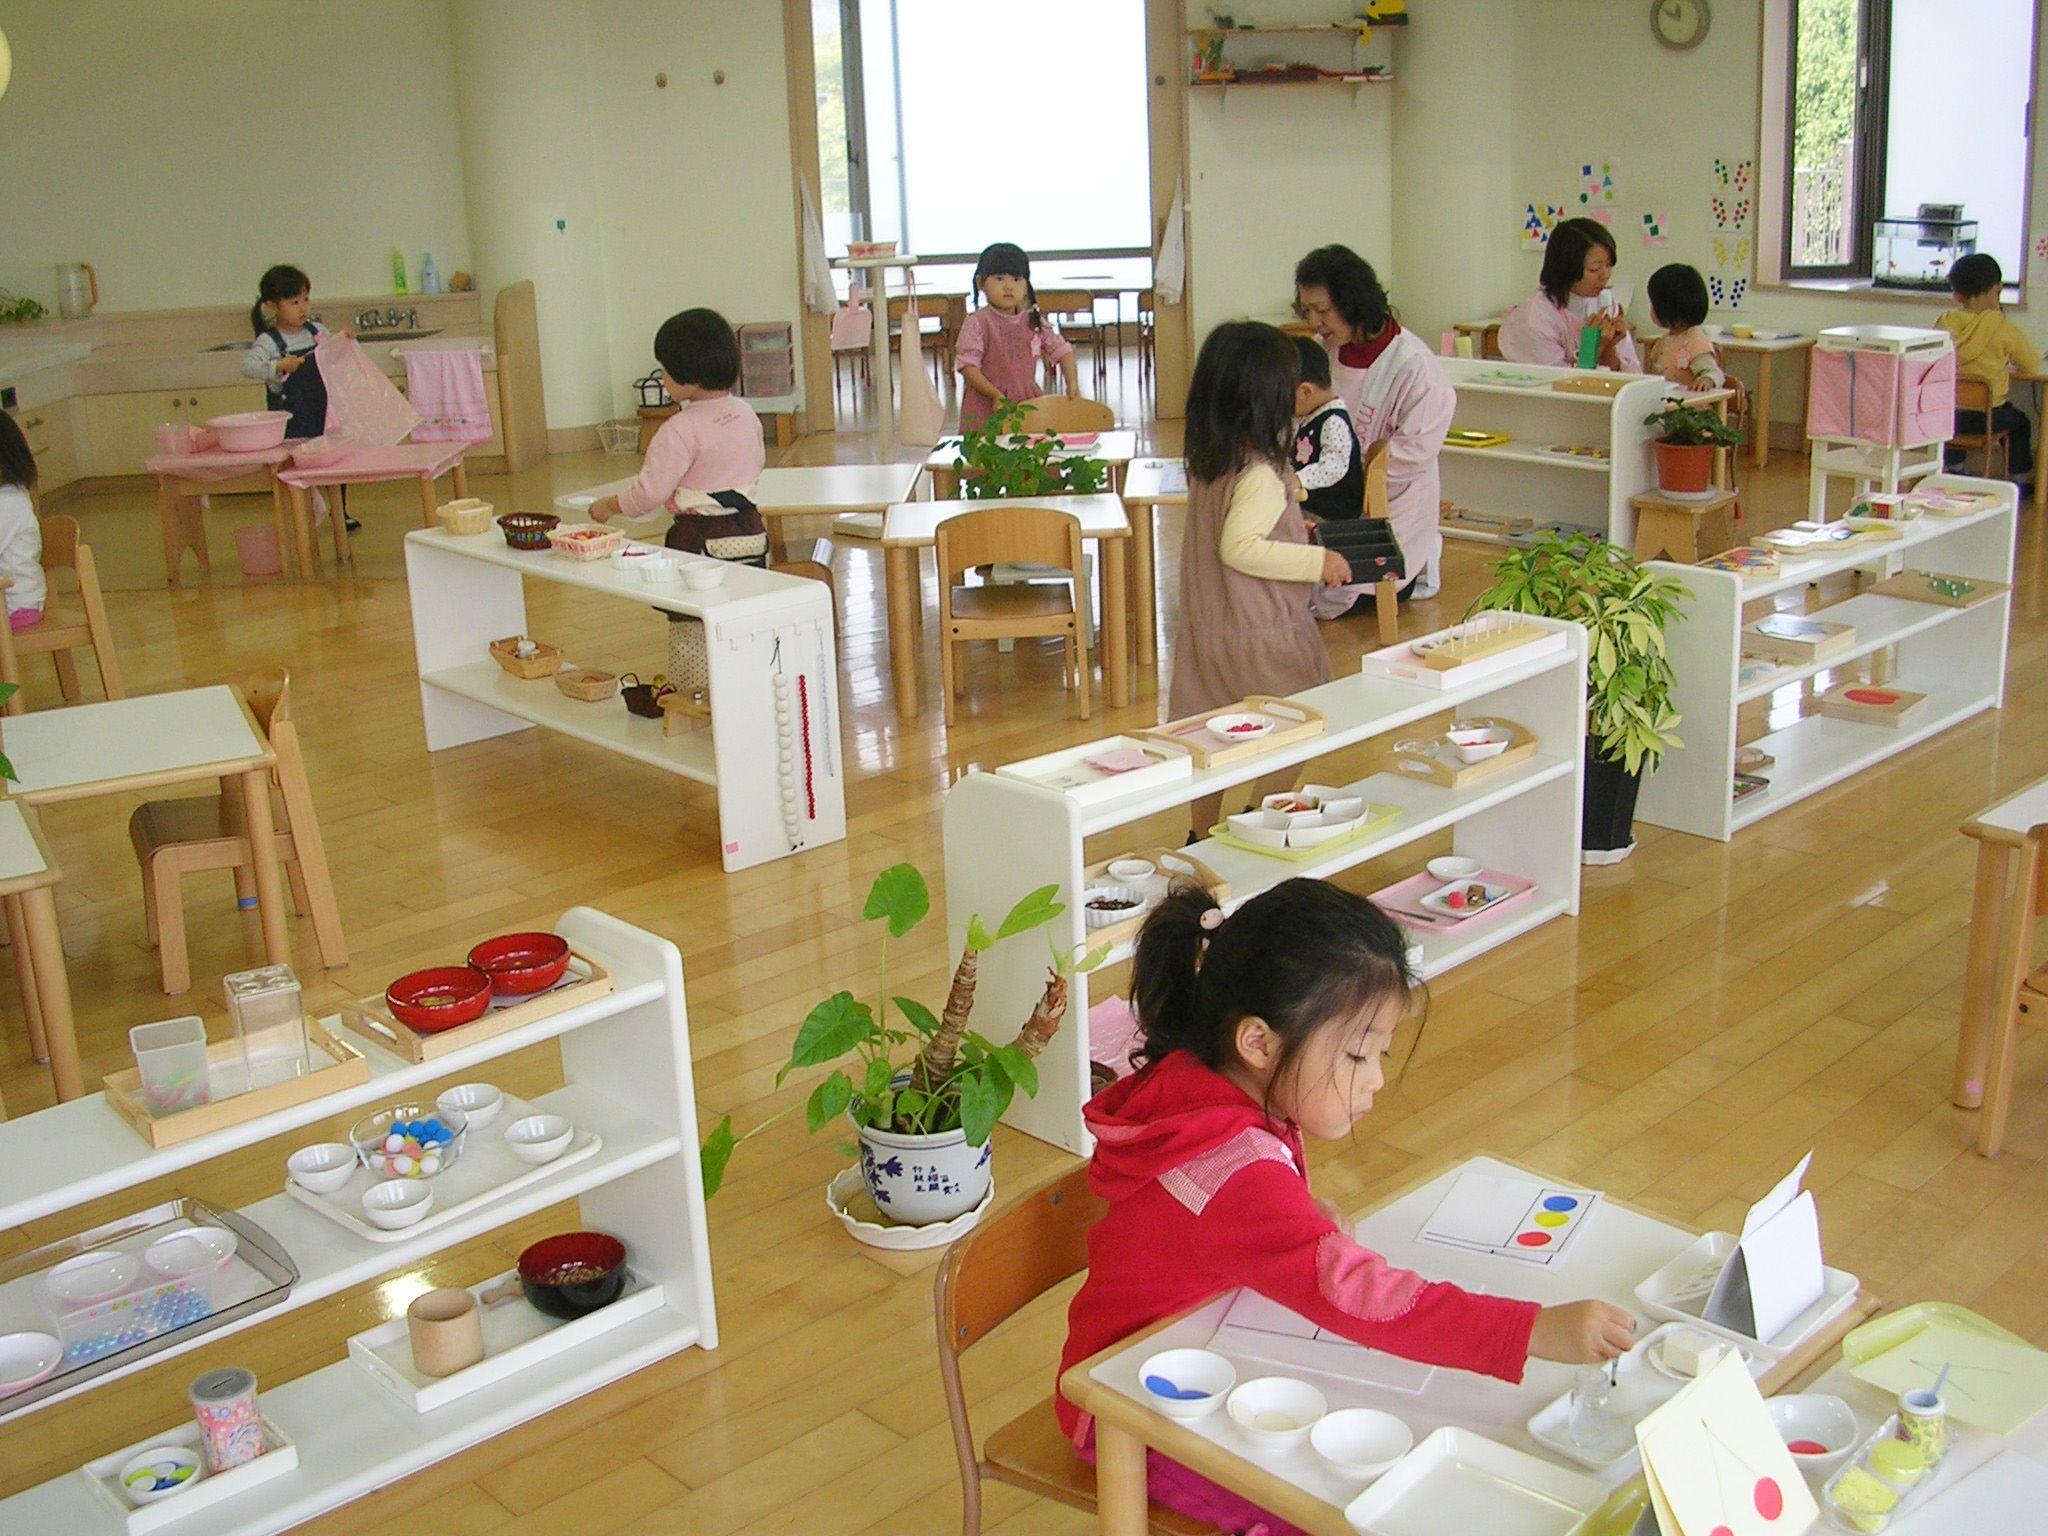 Montessori Classroom Design Pictures : More than just montessori the magic of